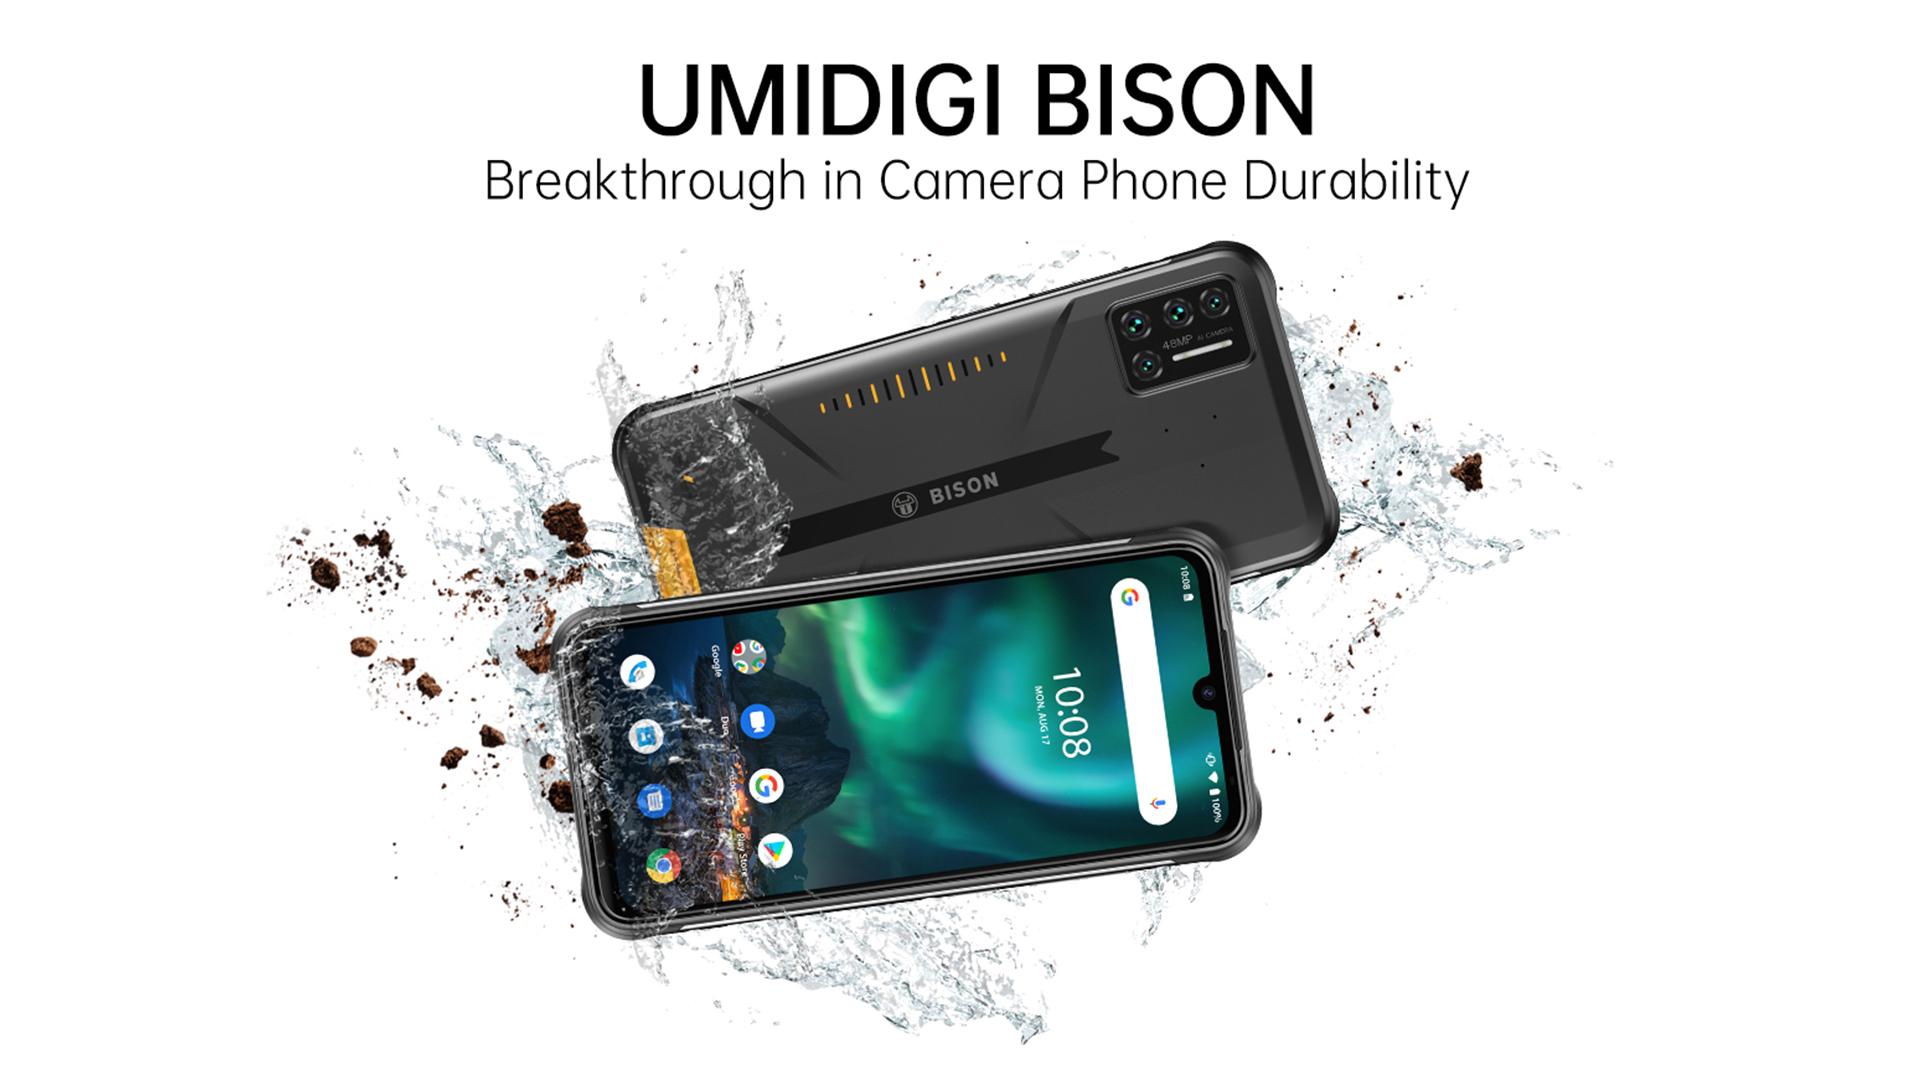 "UMIDIGI BISON IP68/IP69K Waterproof Rugged Phone 48MP Matrix Quad Camera 6.3"" FHD+ Display 6GB+128GB NFC Android Smartphone 4G"